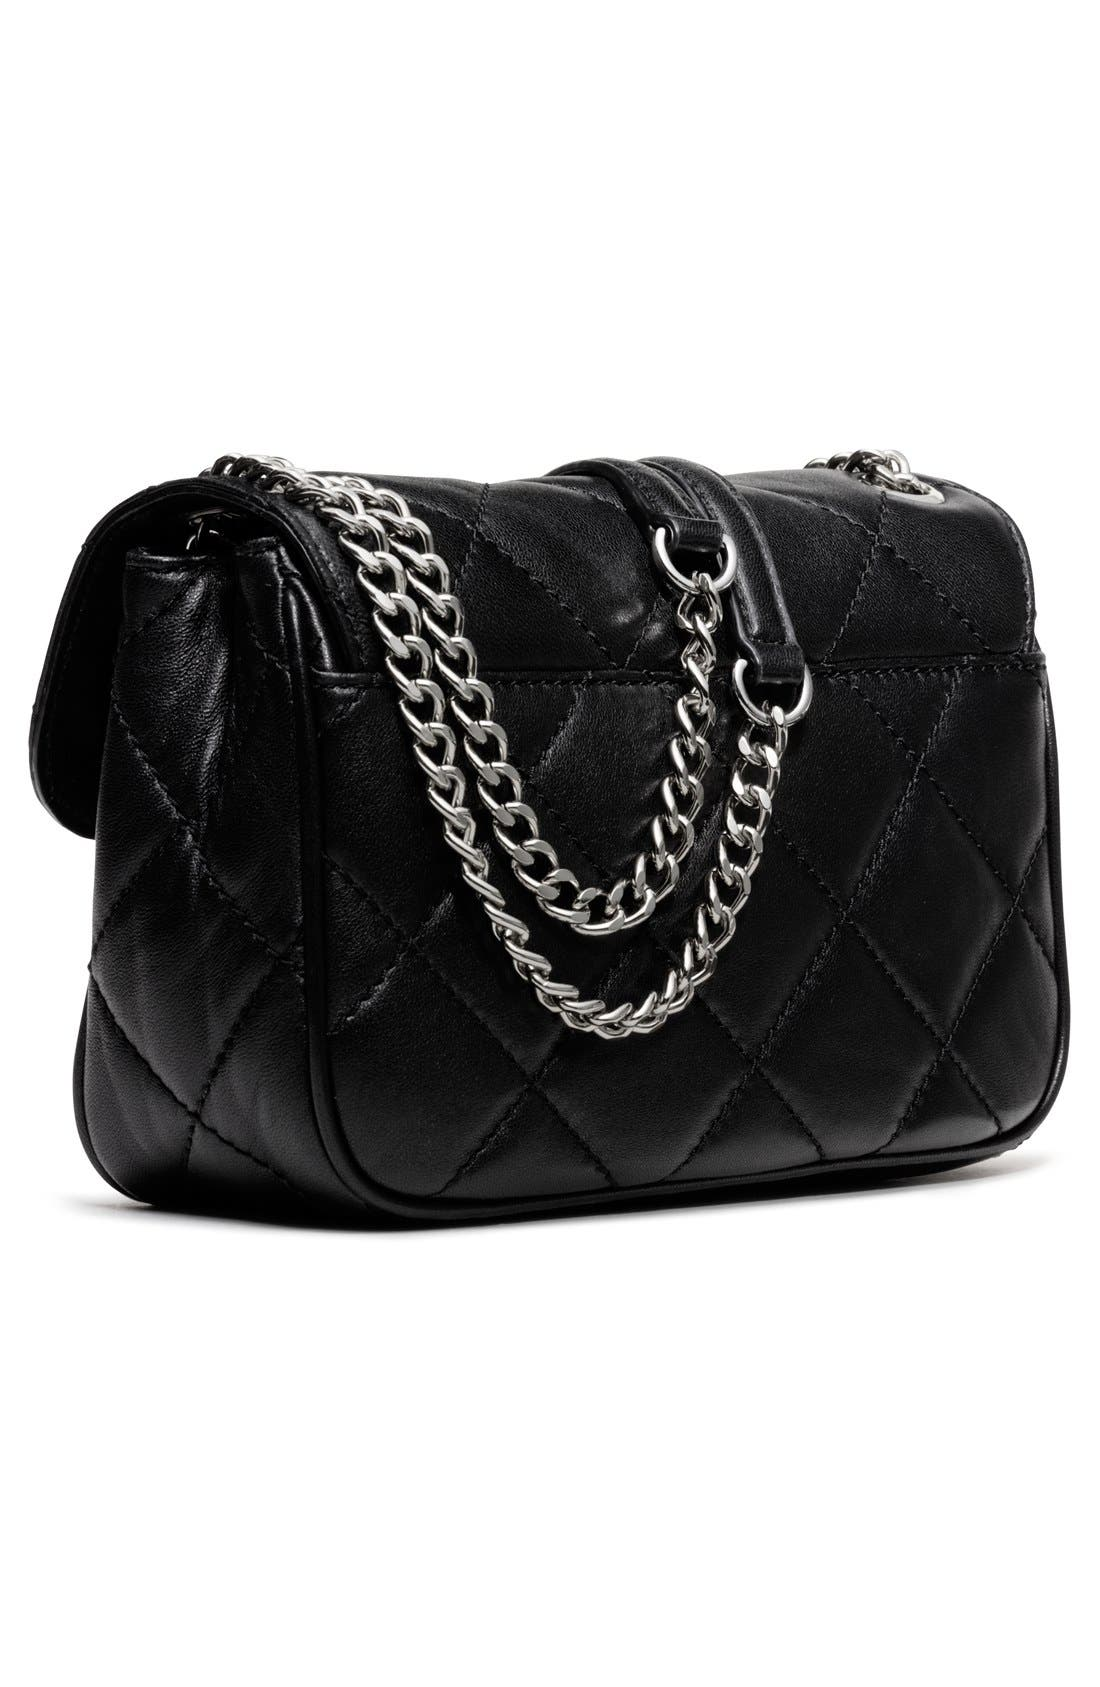 Alternate Image 3  - MICHAEL Michael Kors 'Small Sloan' Quilted Leather Shoulder Bag